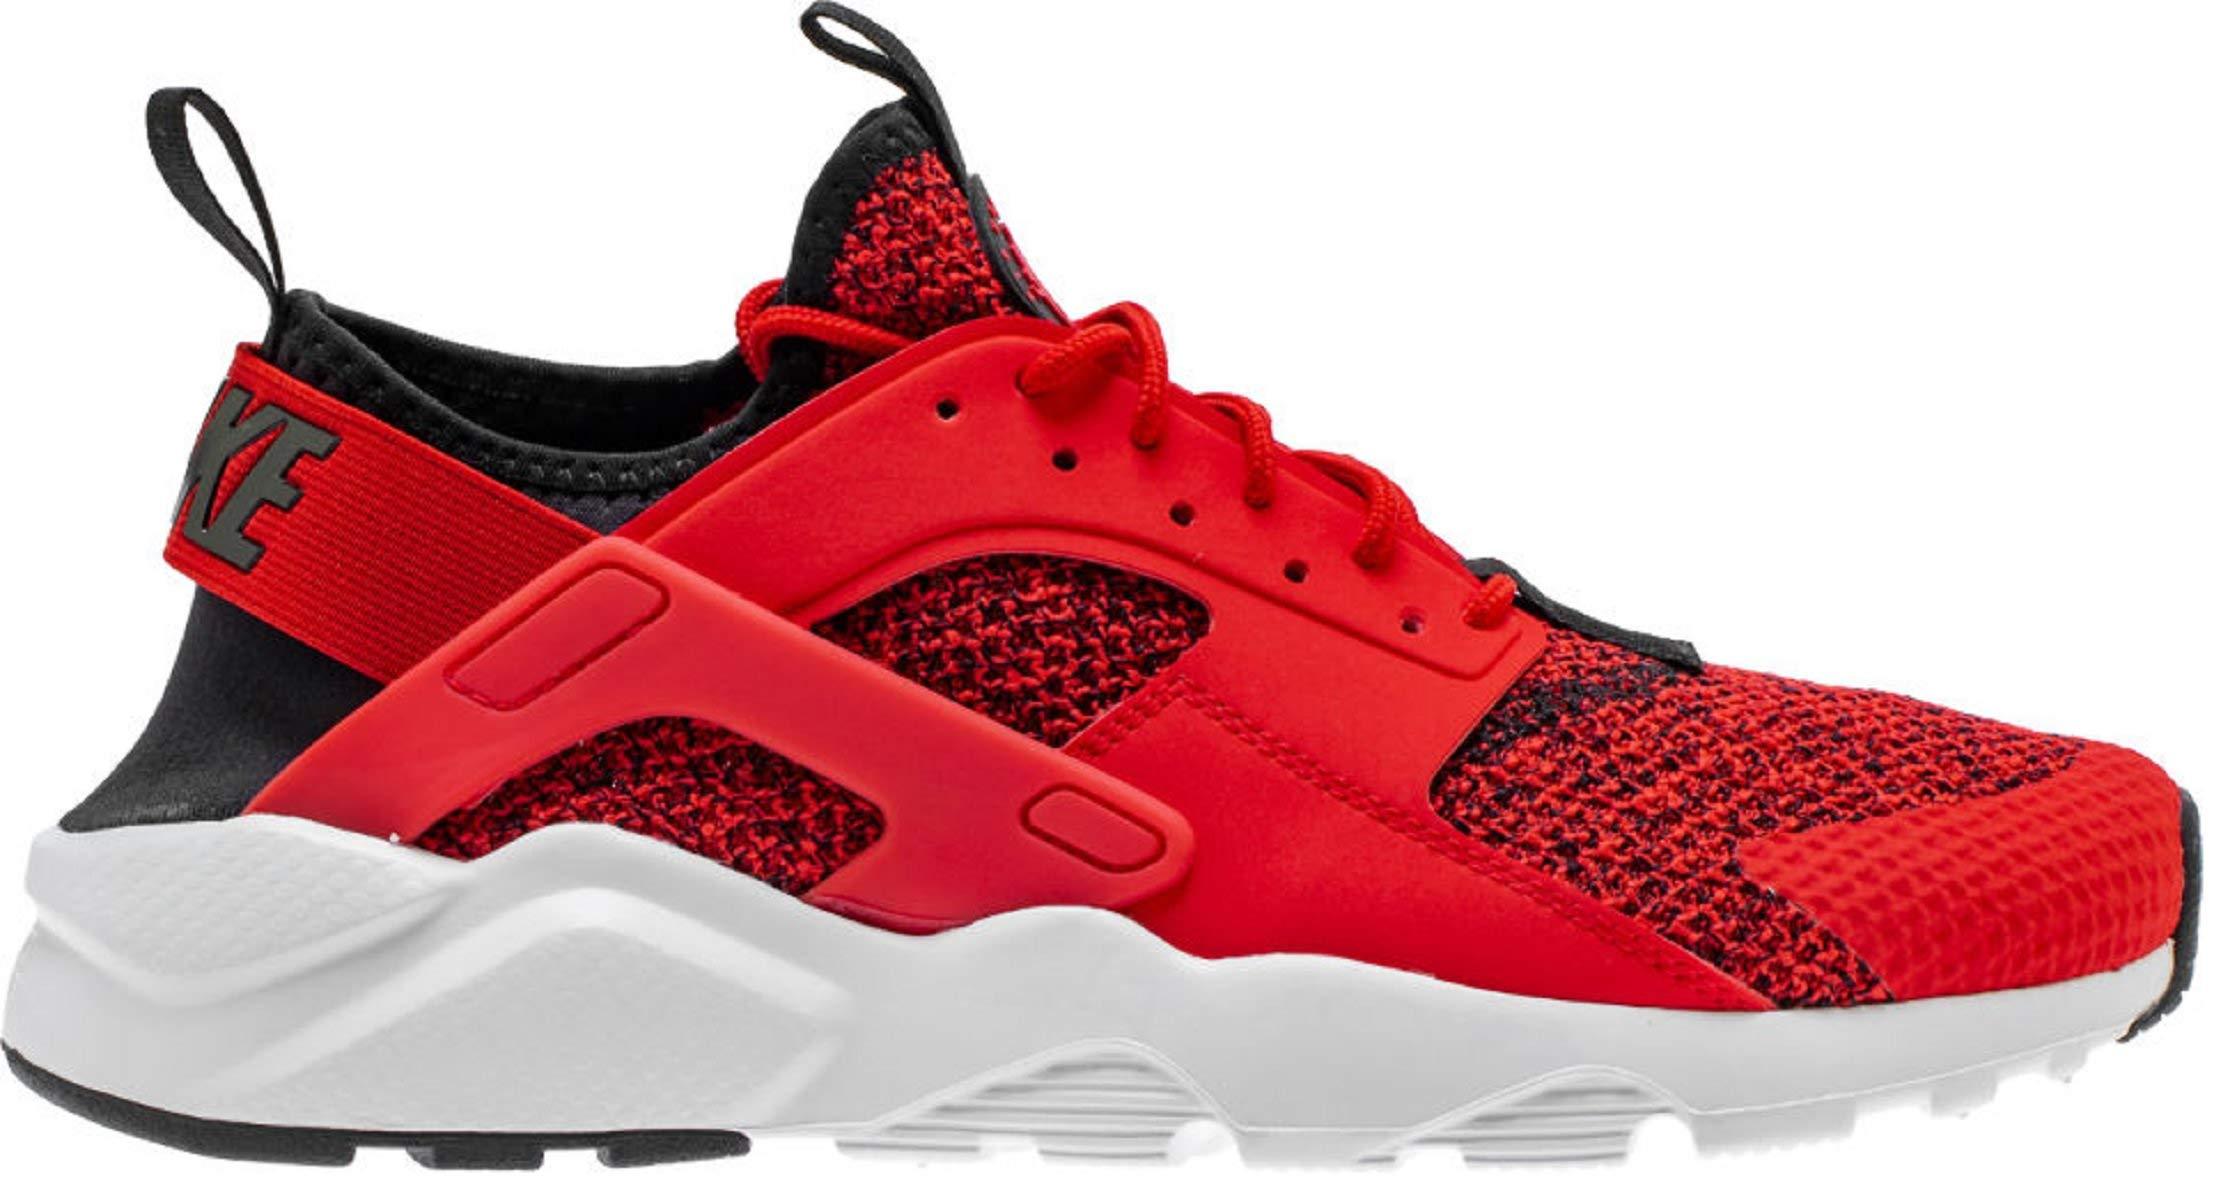 d8b94b425ddfc Galleon - Nike AIR Huarache Run Ultra SE Mens Fashion-Sneakers  875841-603 8.5 - University RED Black-White